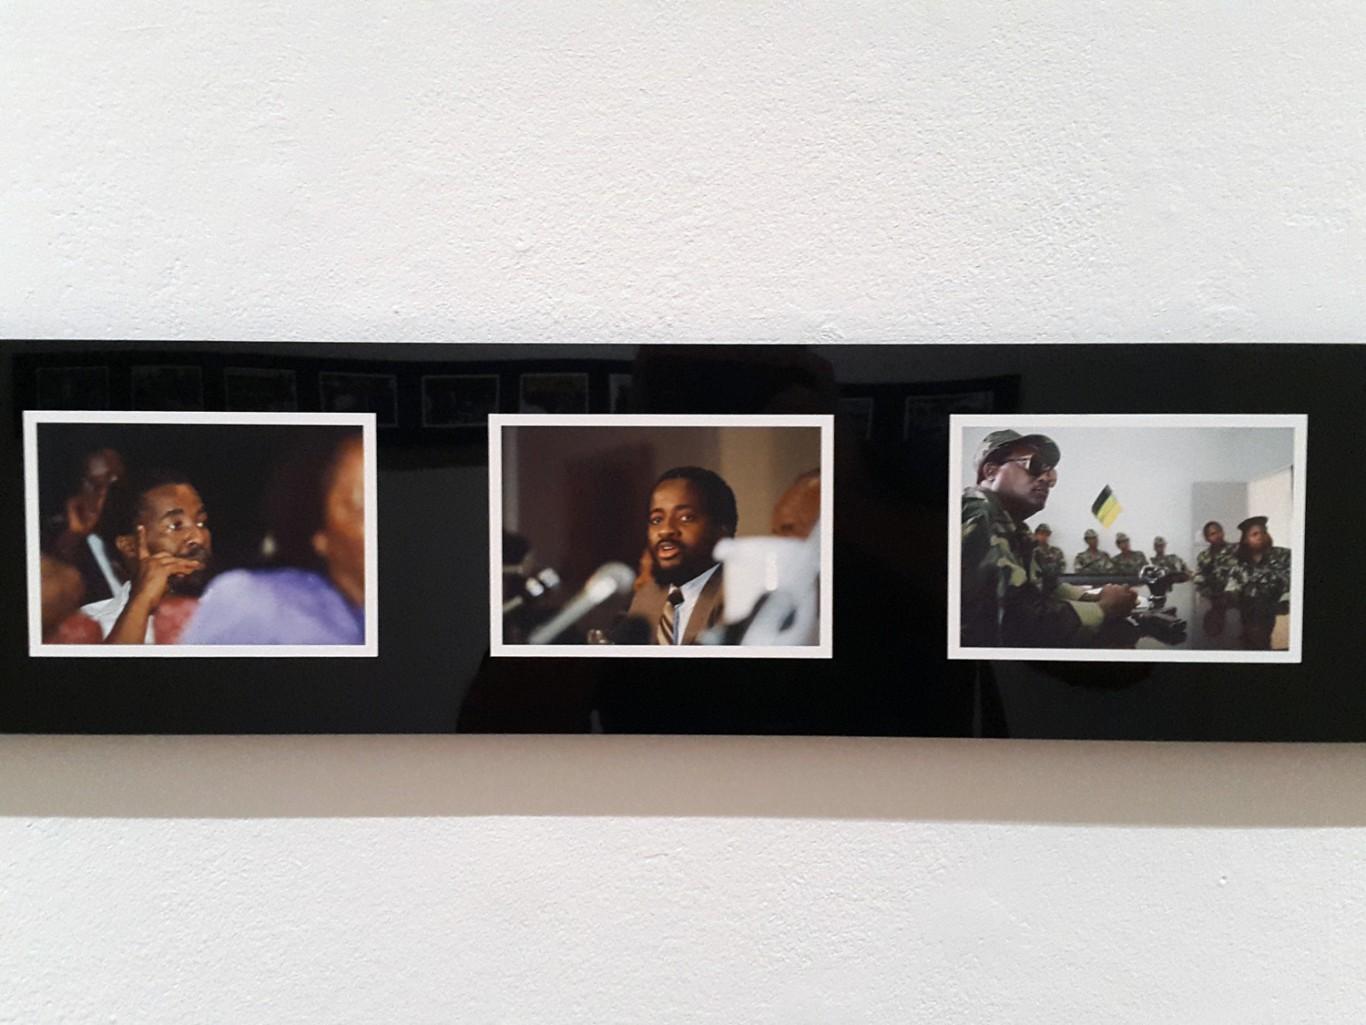 Laurie Sparham at Michaelis Galleries